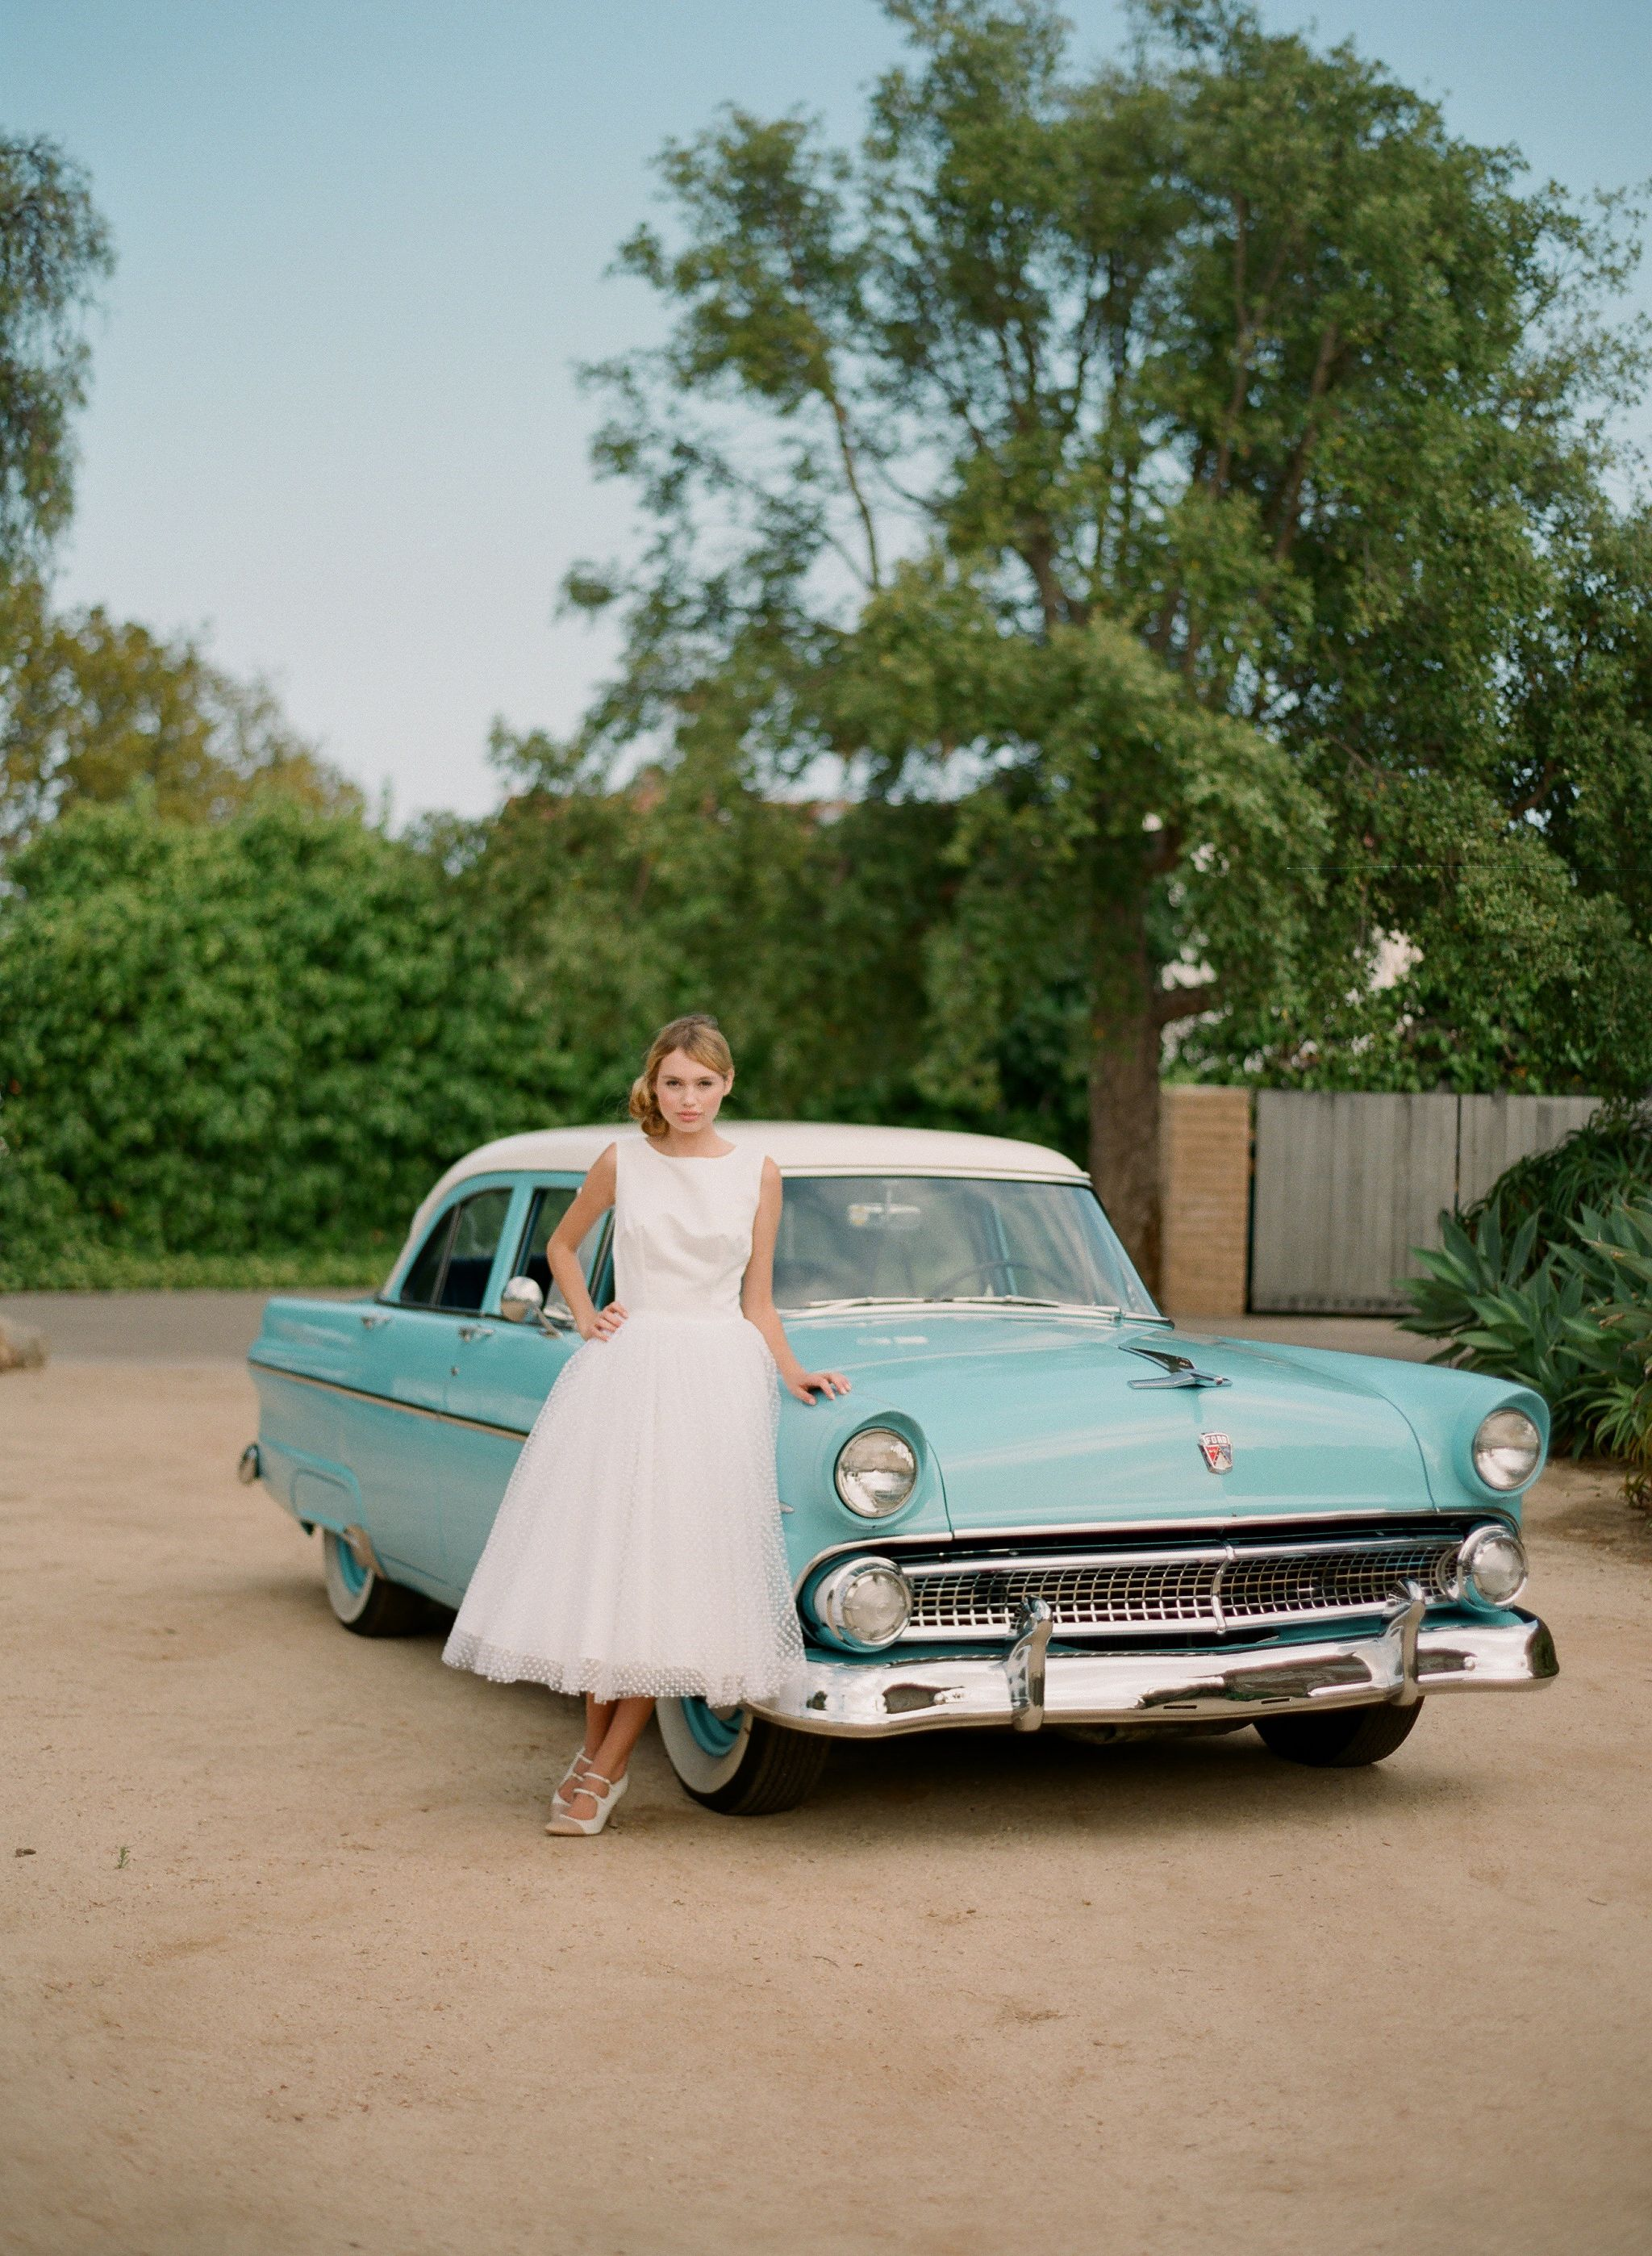 Wedding car decorations just married  vintage car bridal portraits  Photography  wedding  Pinterest